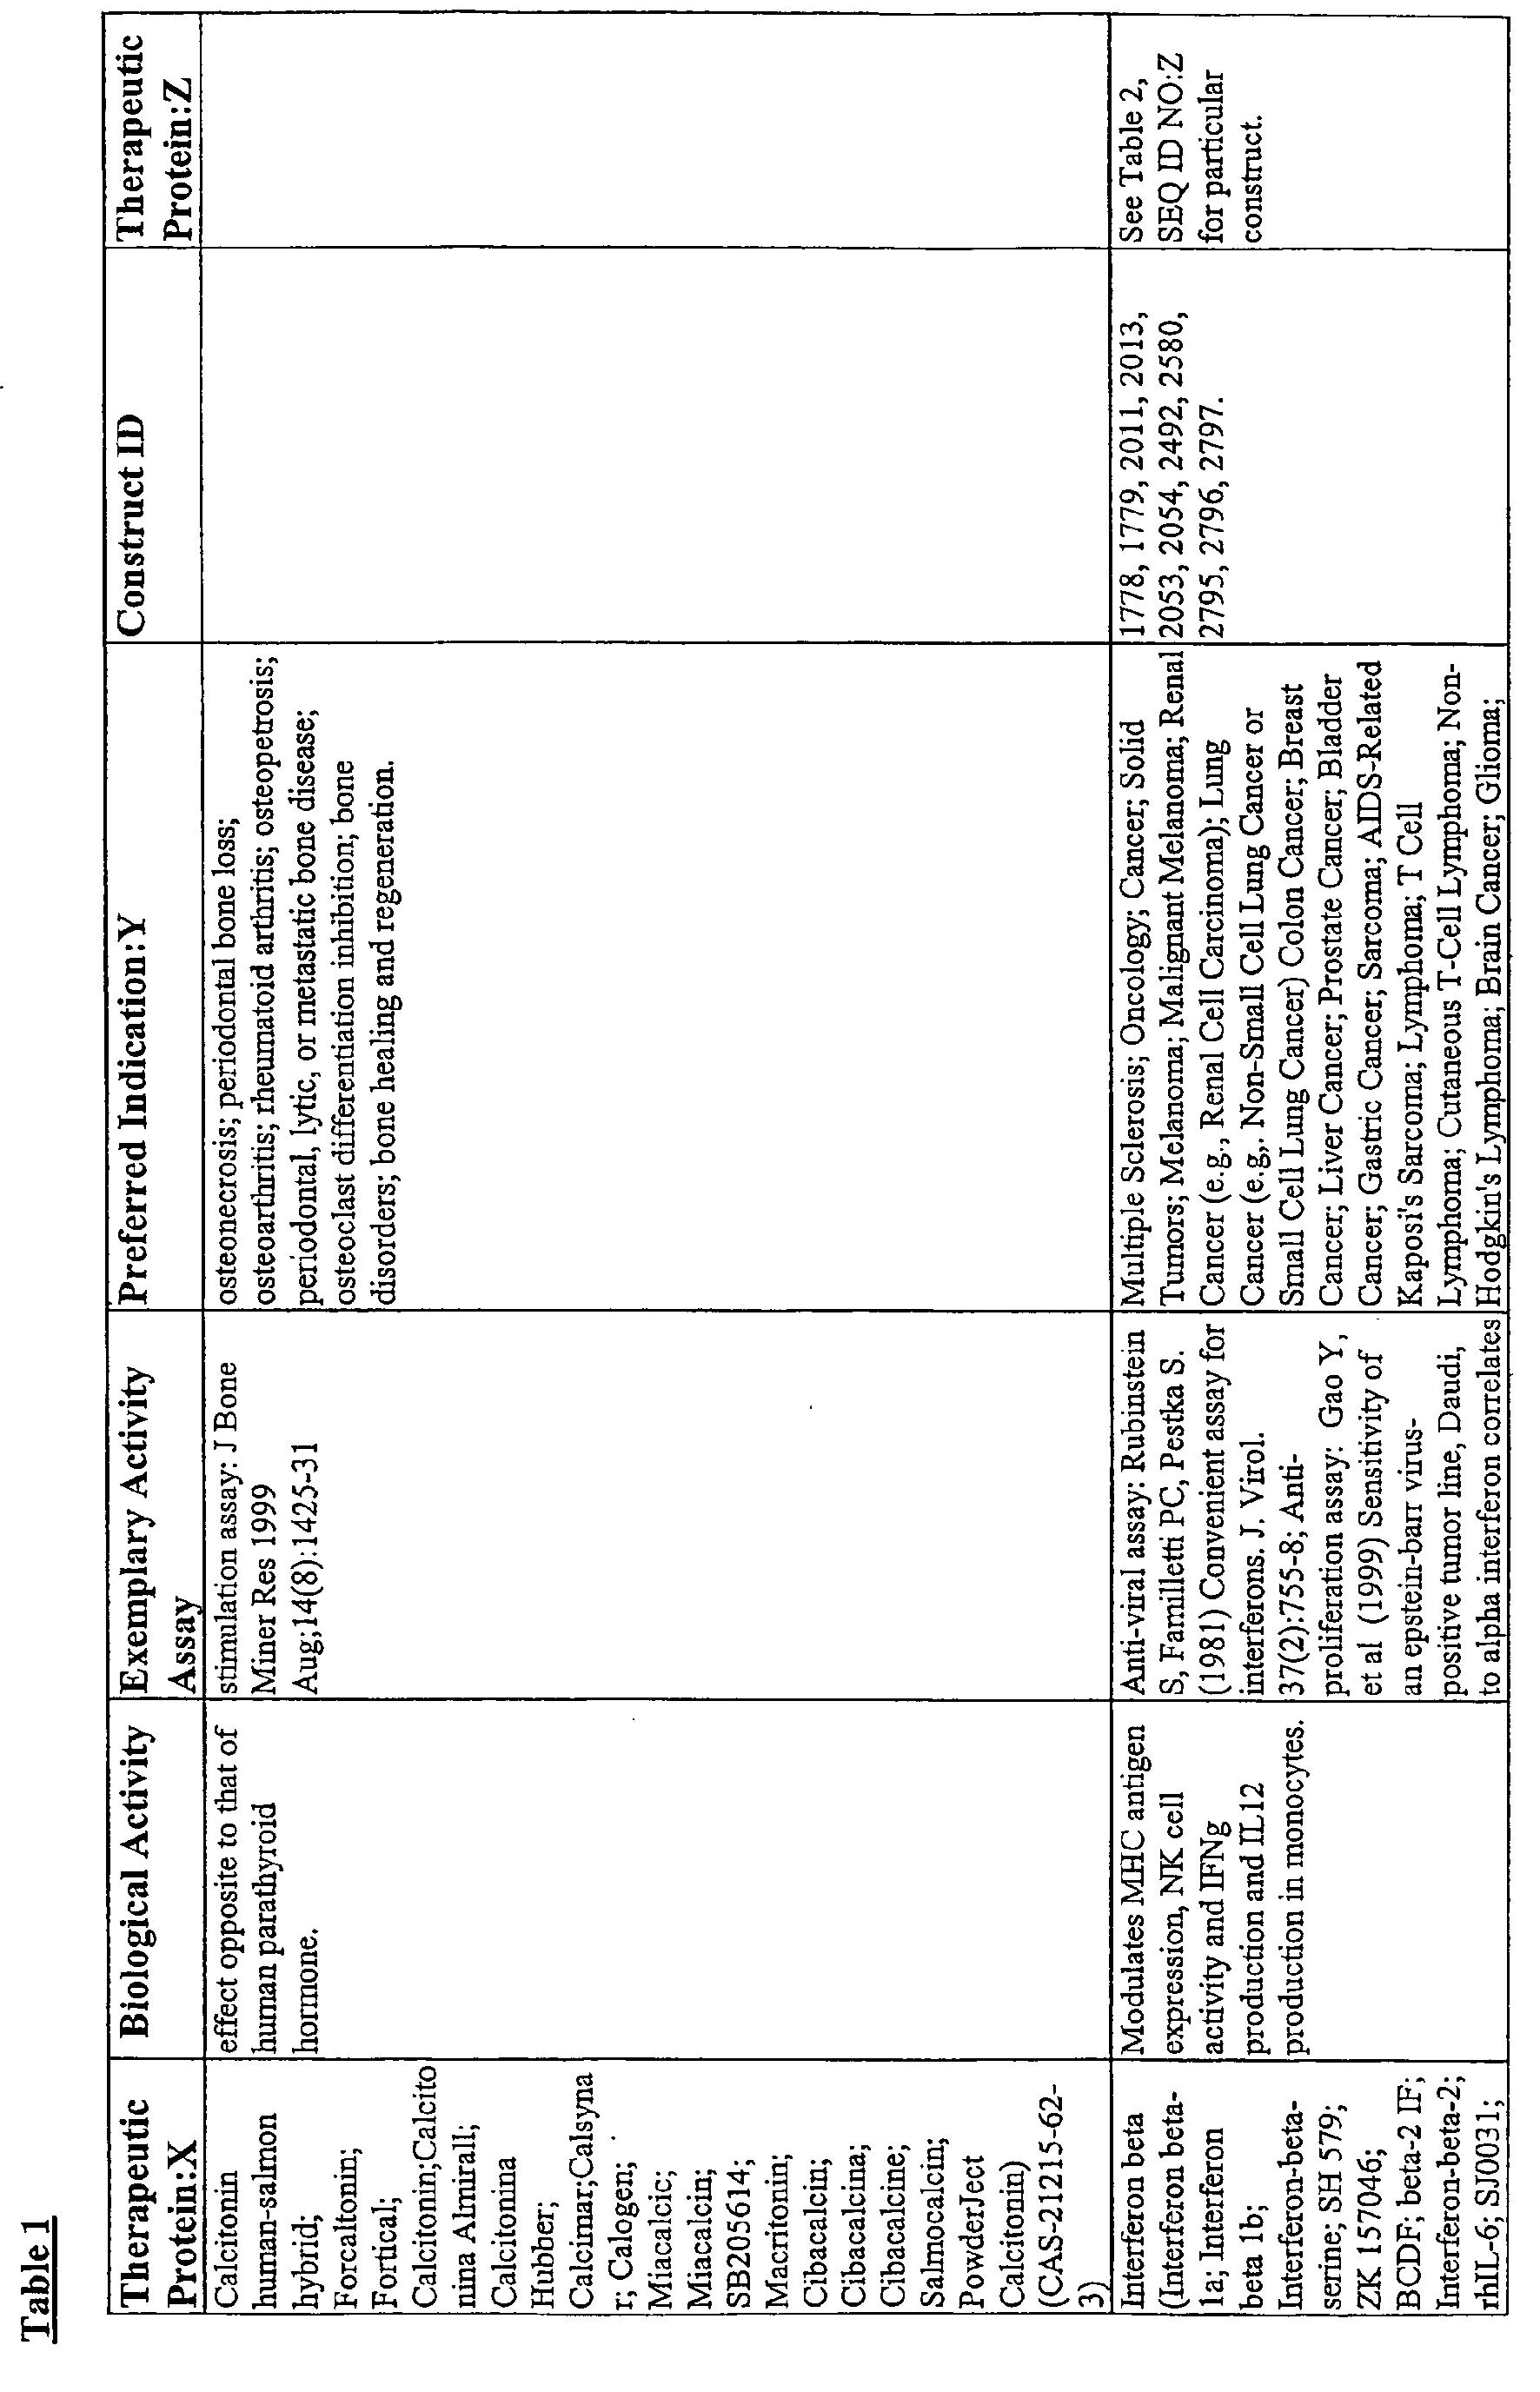 Albumin fusion proteins   Patent 20